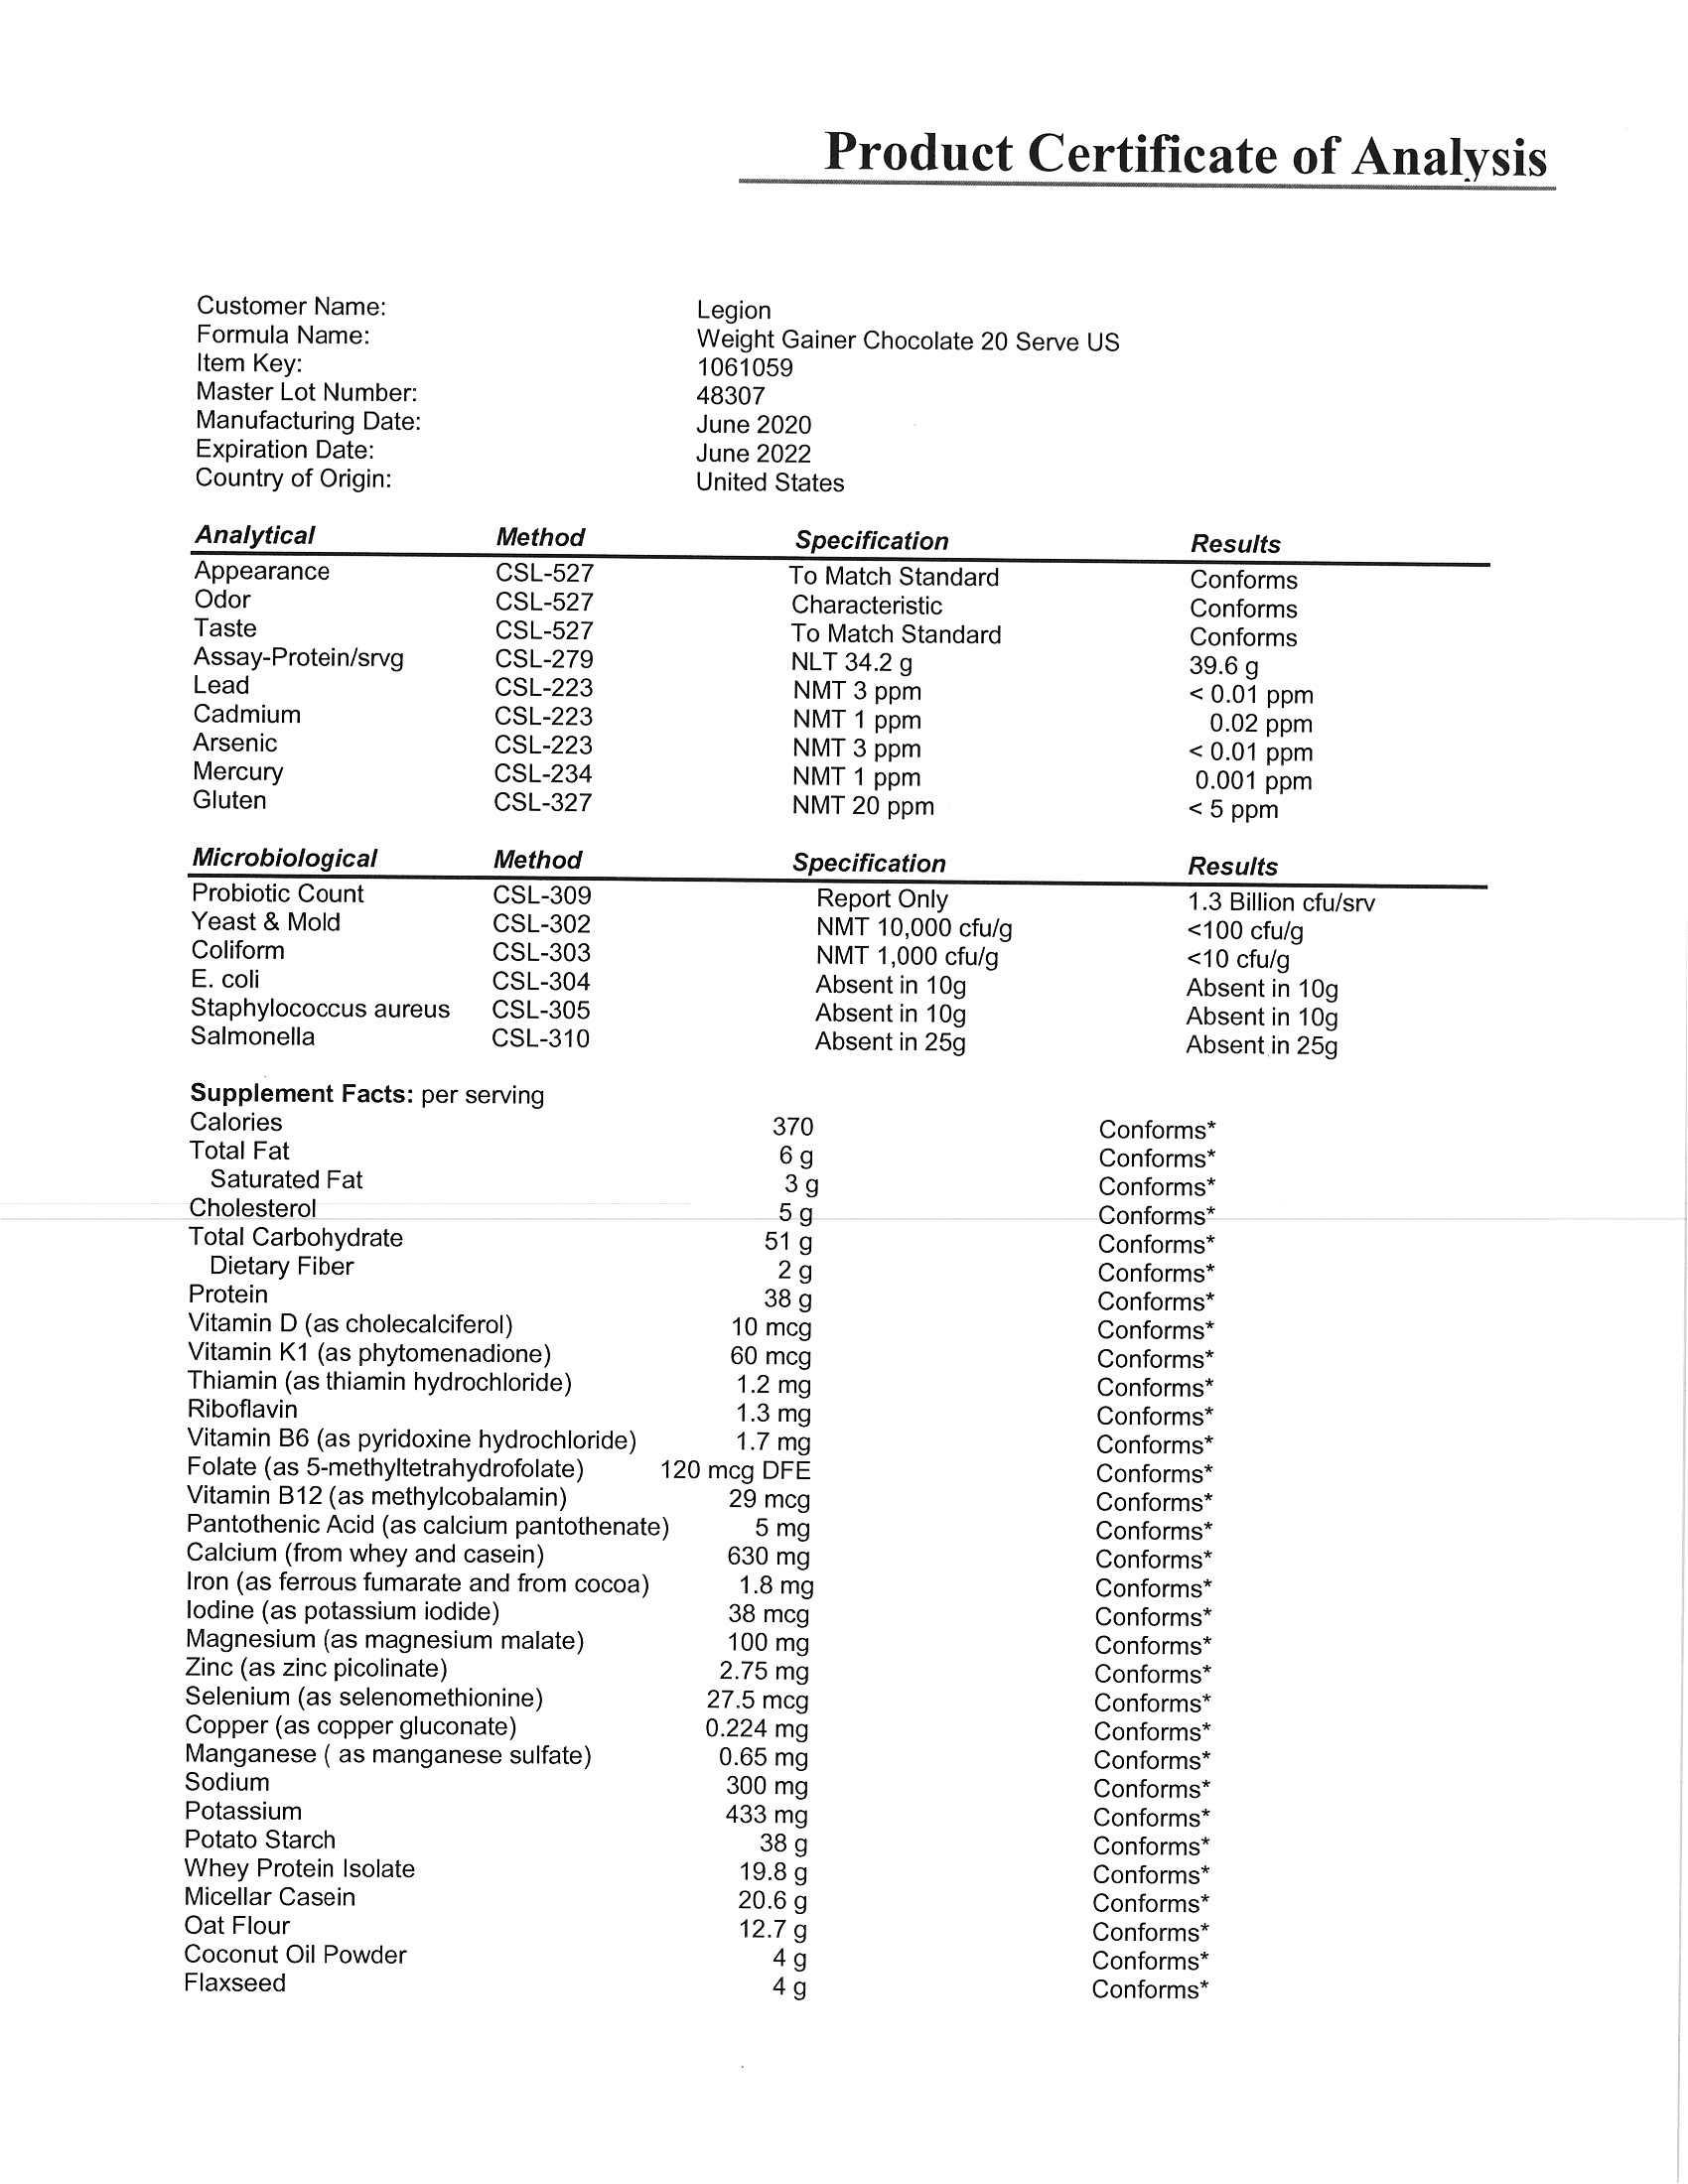 Atlas Lab Test Certificate Page 1